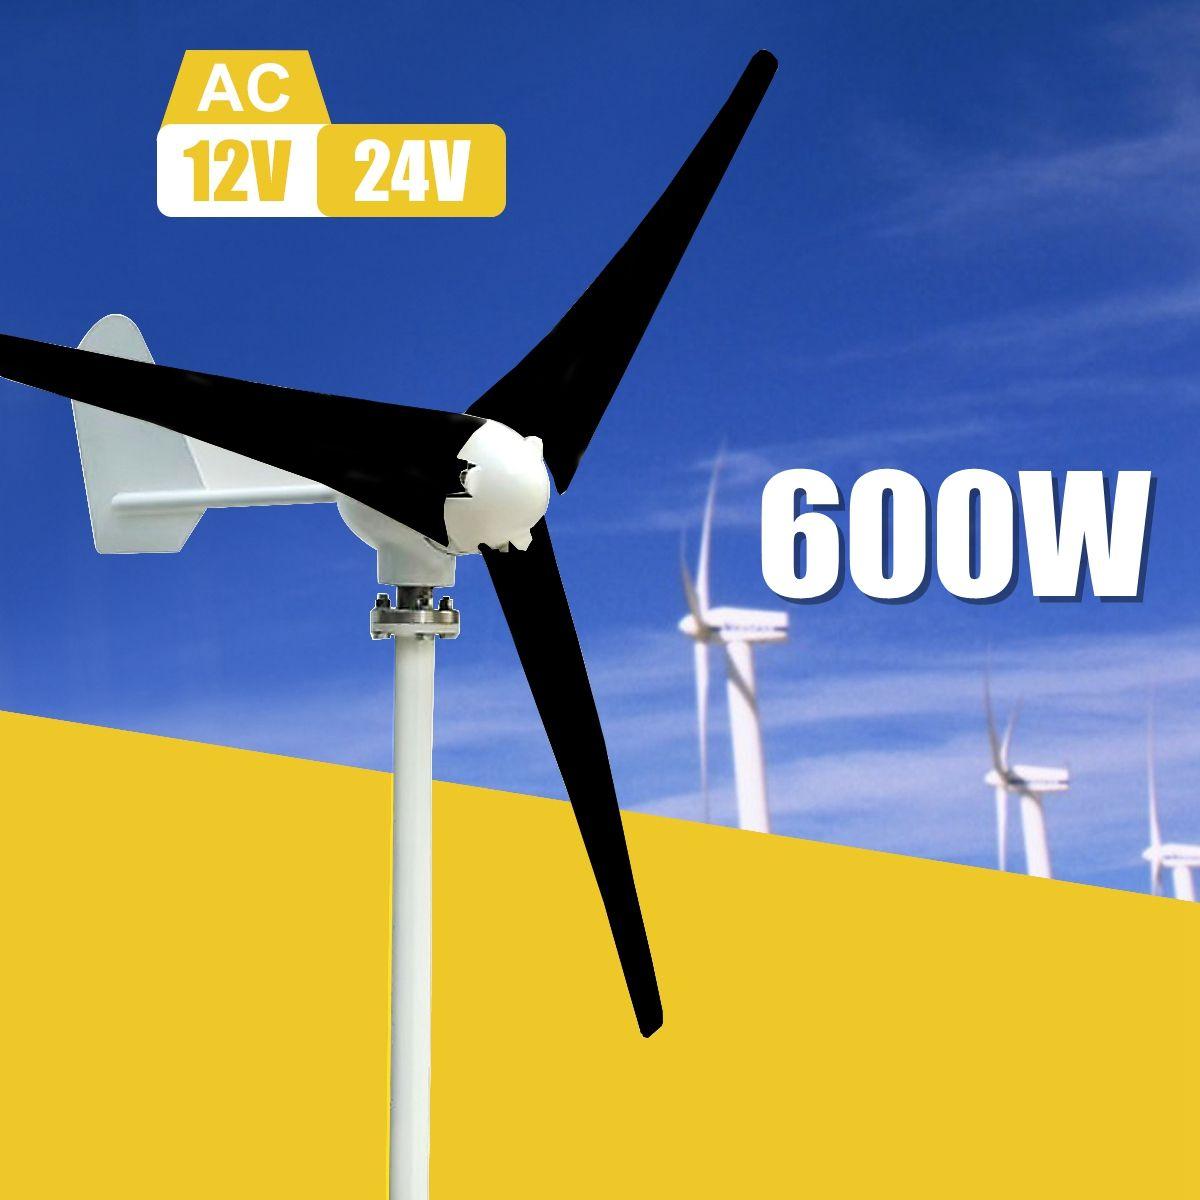 Max 600W Wind Turbine Generator Kit Max AC 12V 24V 3 Blade Option Aerogenerator